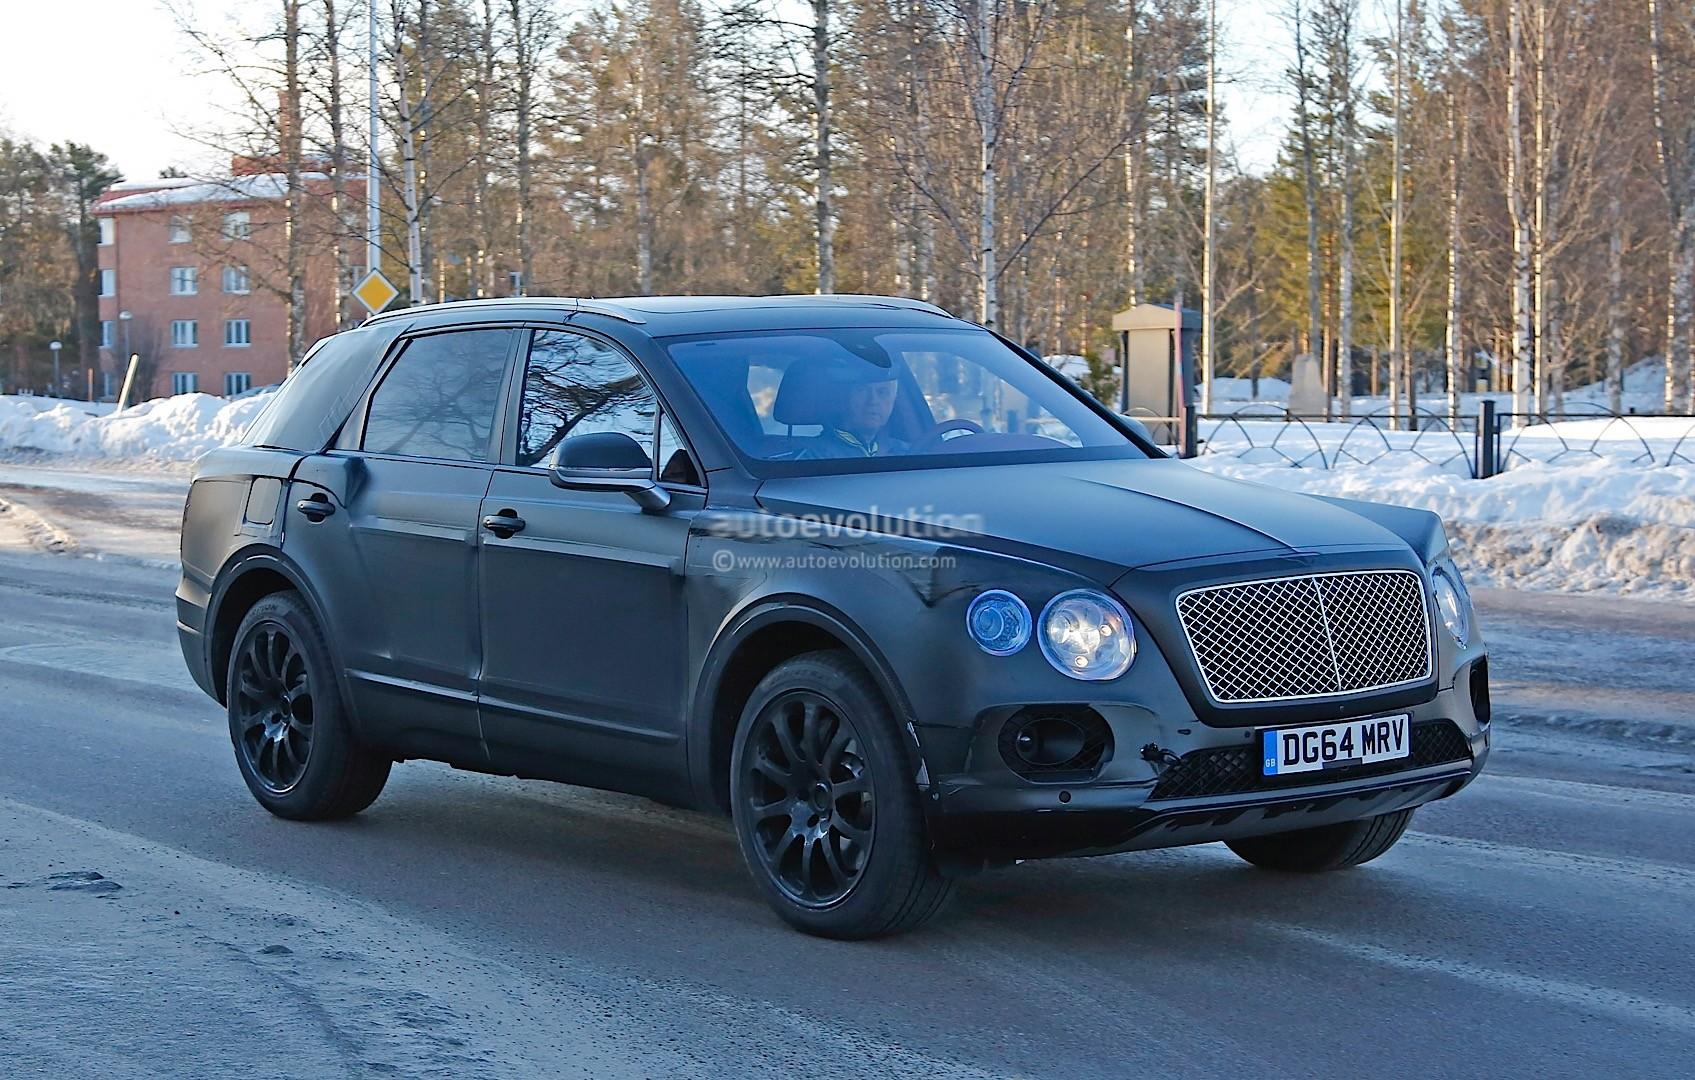 2015 - [Bentley] Bentayga - Page 5 Bentley-bentayga-spied-once-again-looks-like-an-edgier-vw-touareg-photo-gallery_4